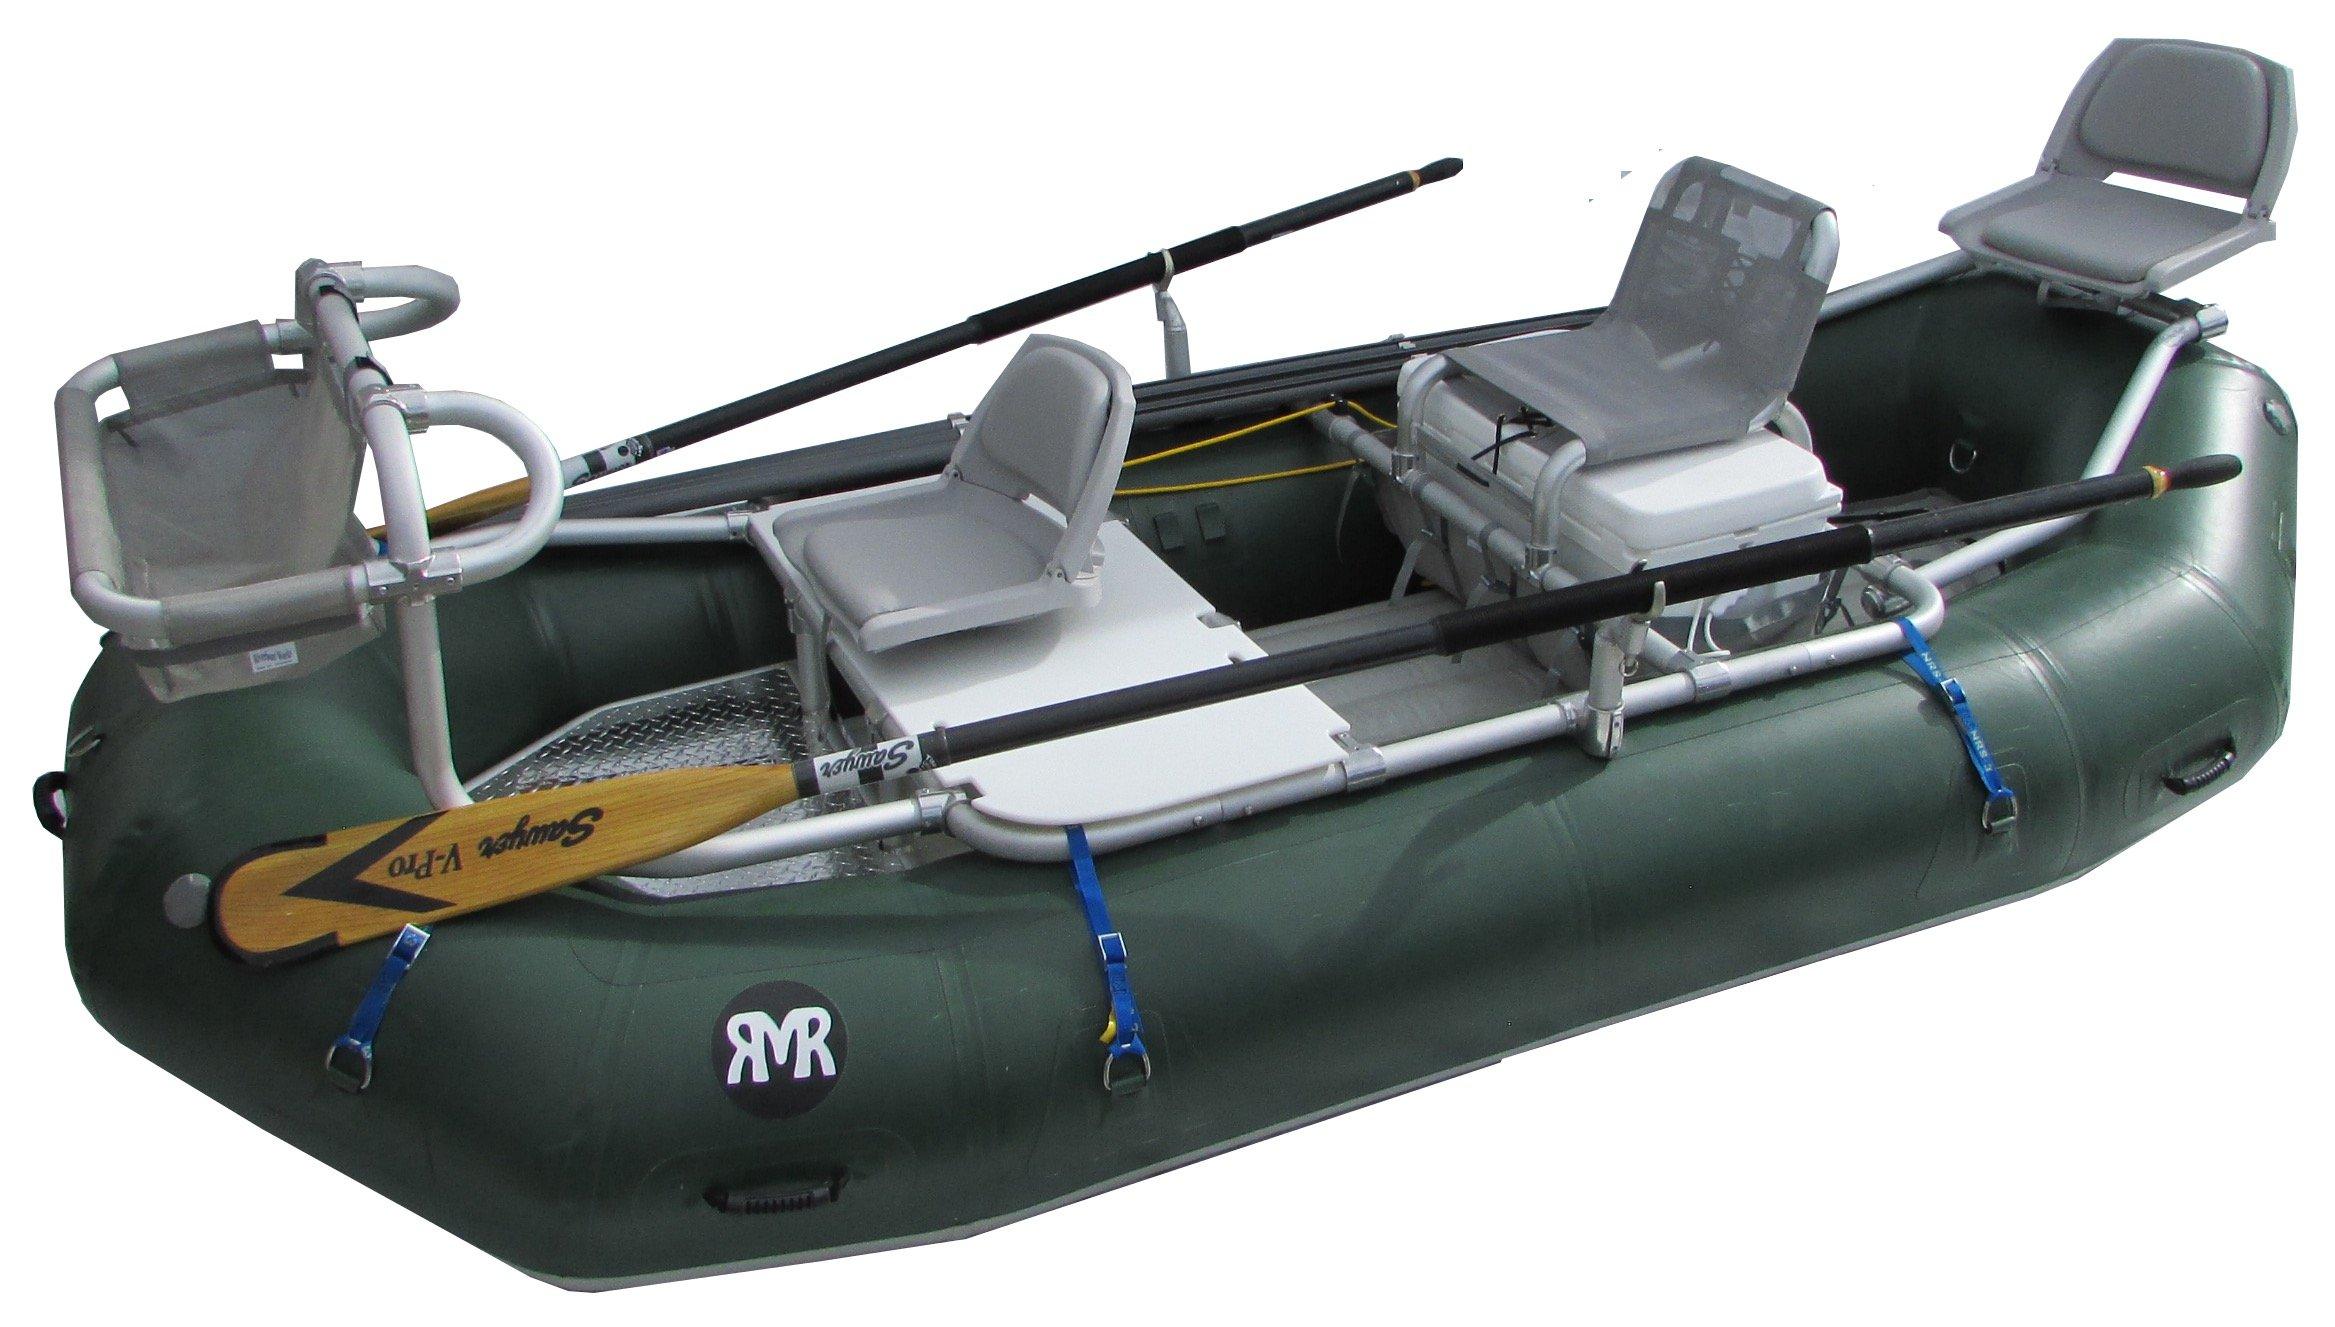 Caddis for Fly fishing raft